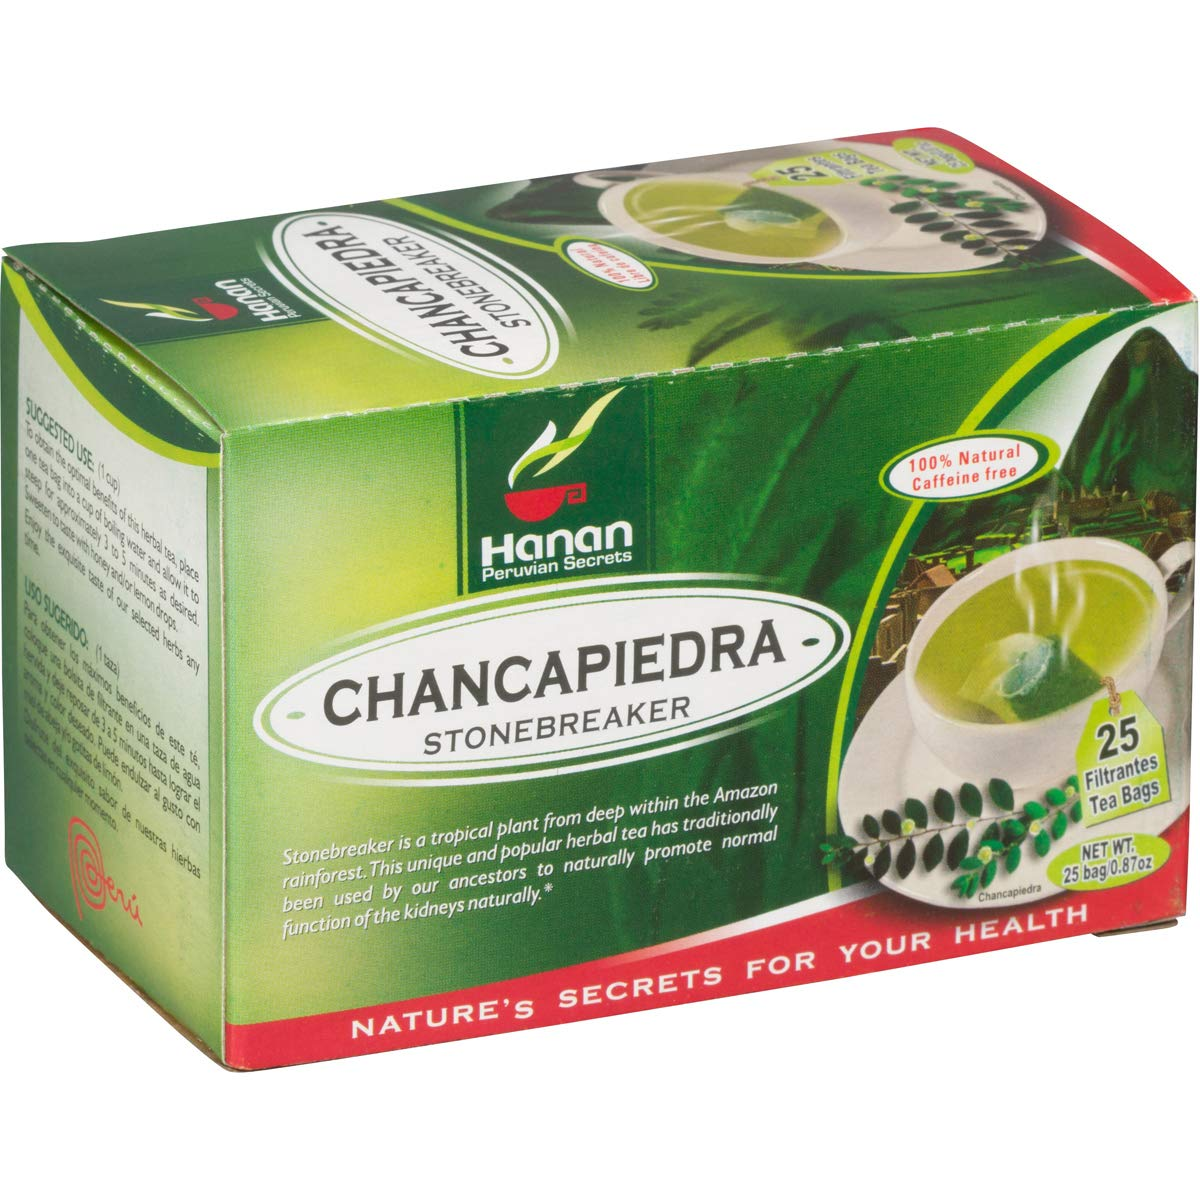 Chanca Piedra Tea - 25 Teabags - Peruvian Naturals |''Stonebreaker'' for Kidney, Stone and Urinary Health